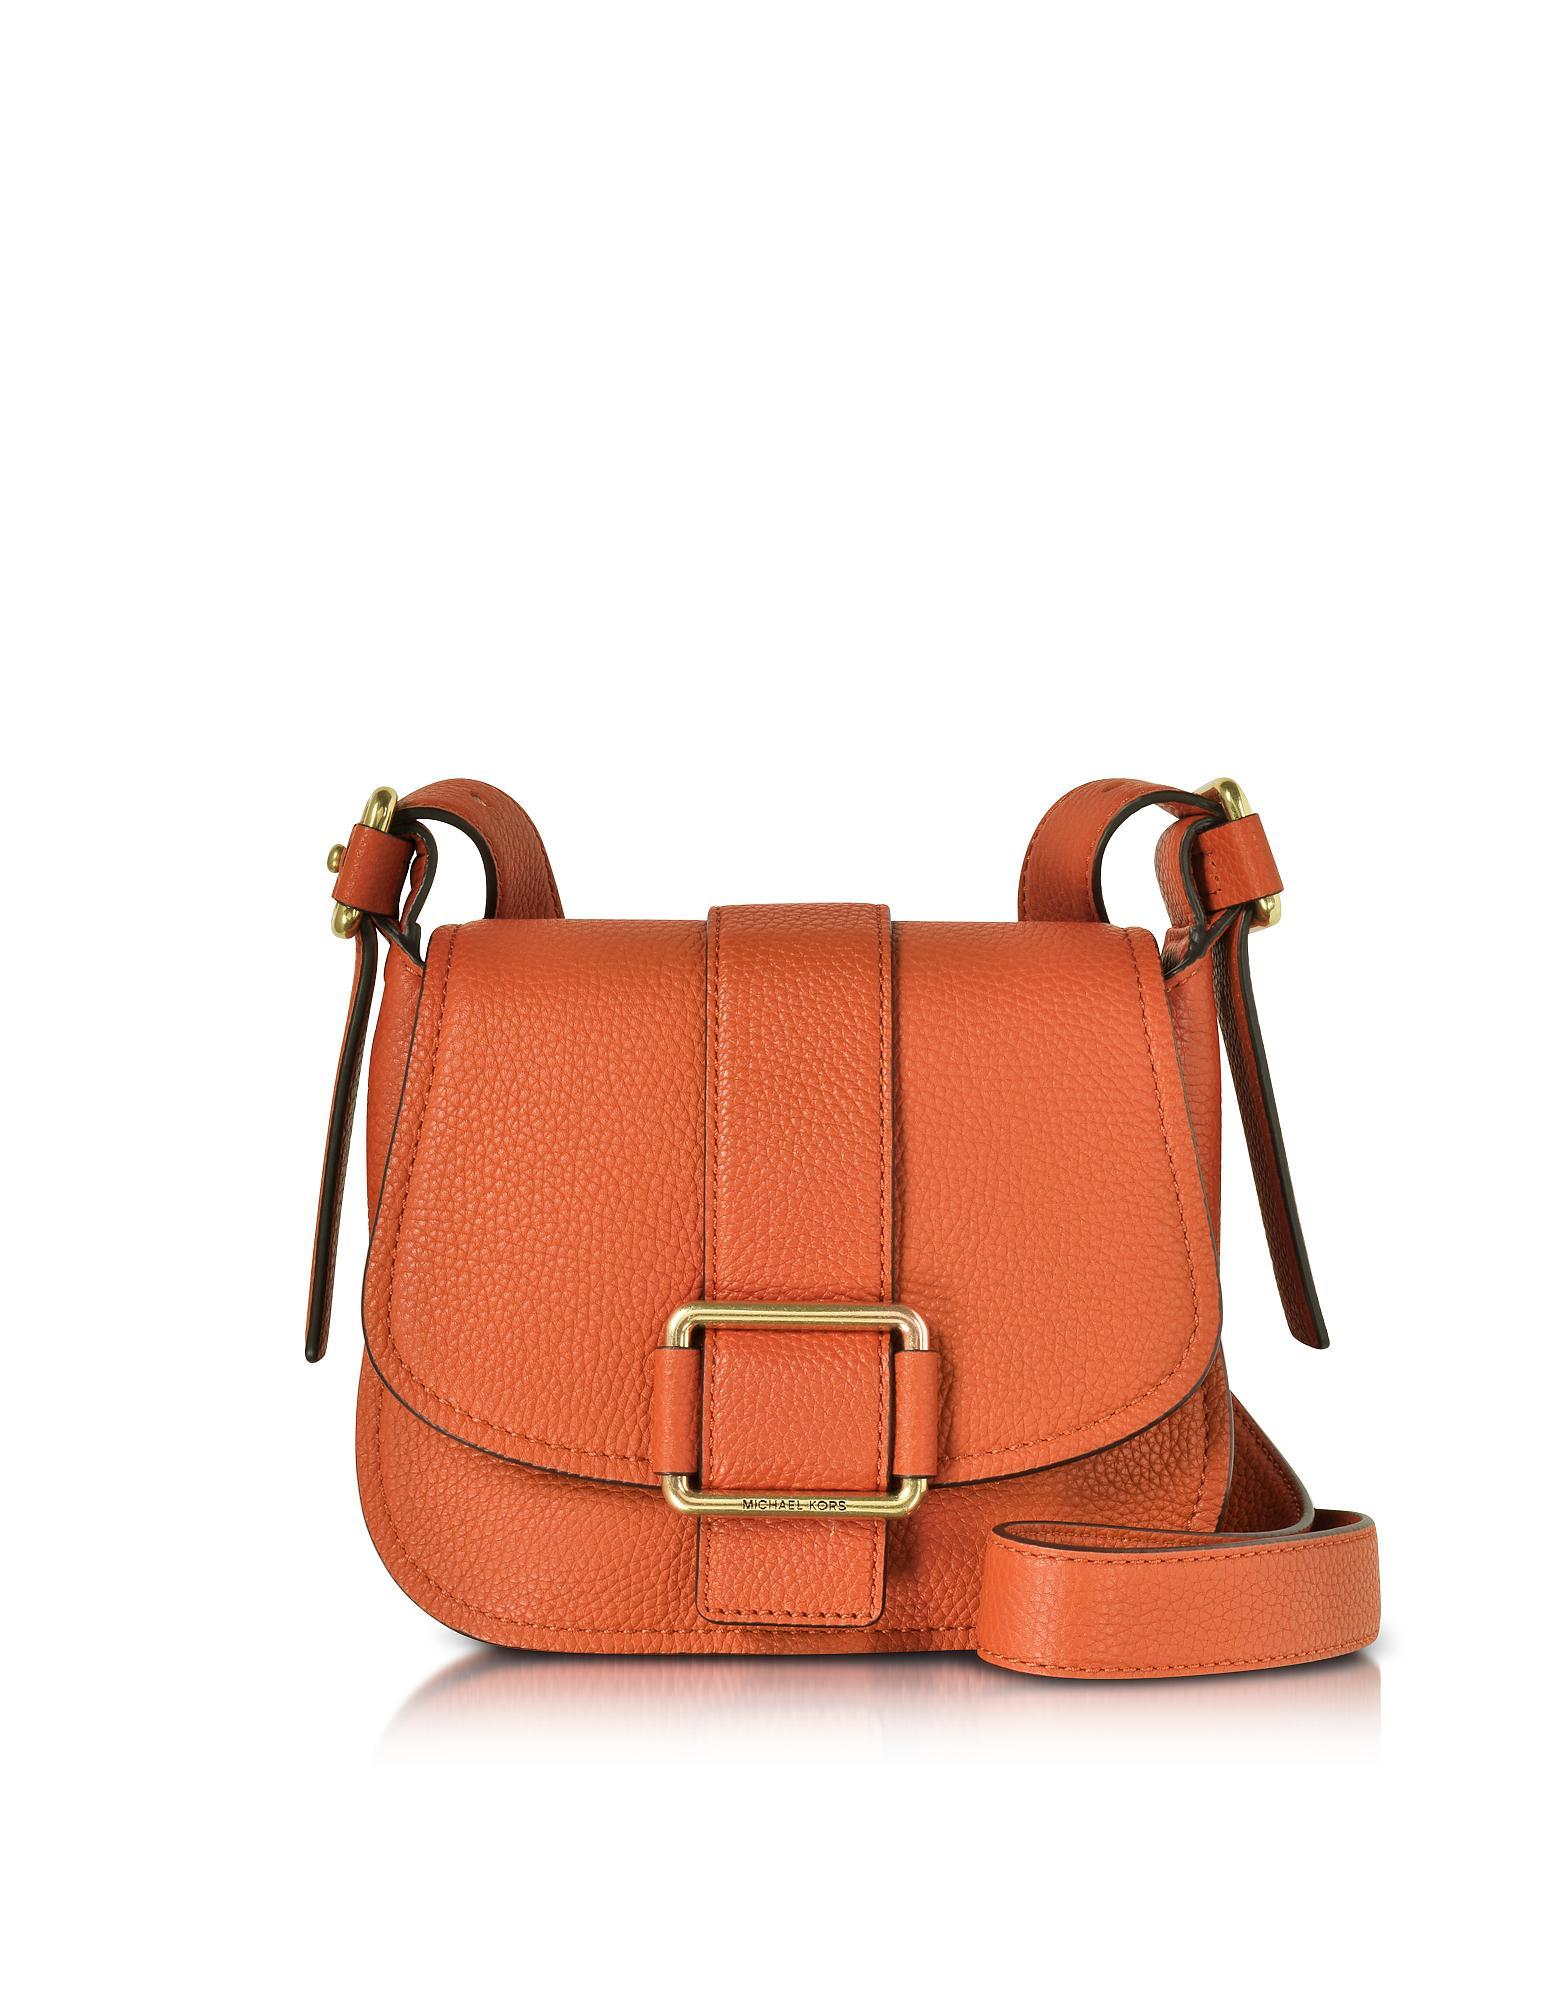 cfa8744cd0e Lyst - Michael Kors Maxine Medium Leather Saddle Bag in Orange